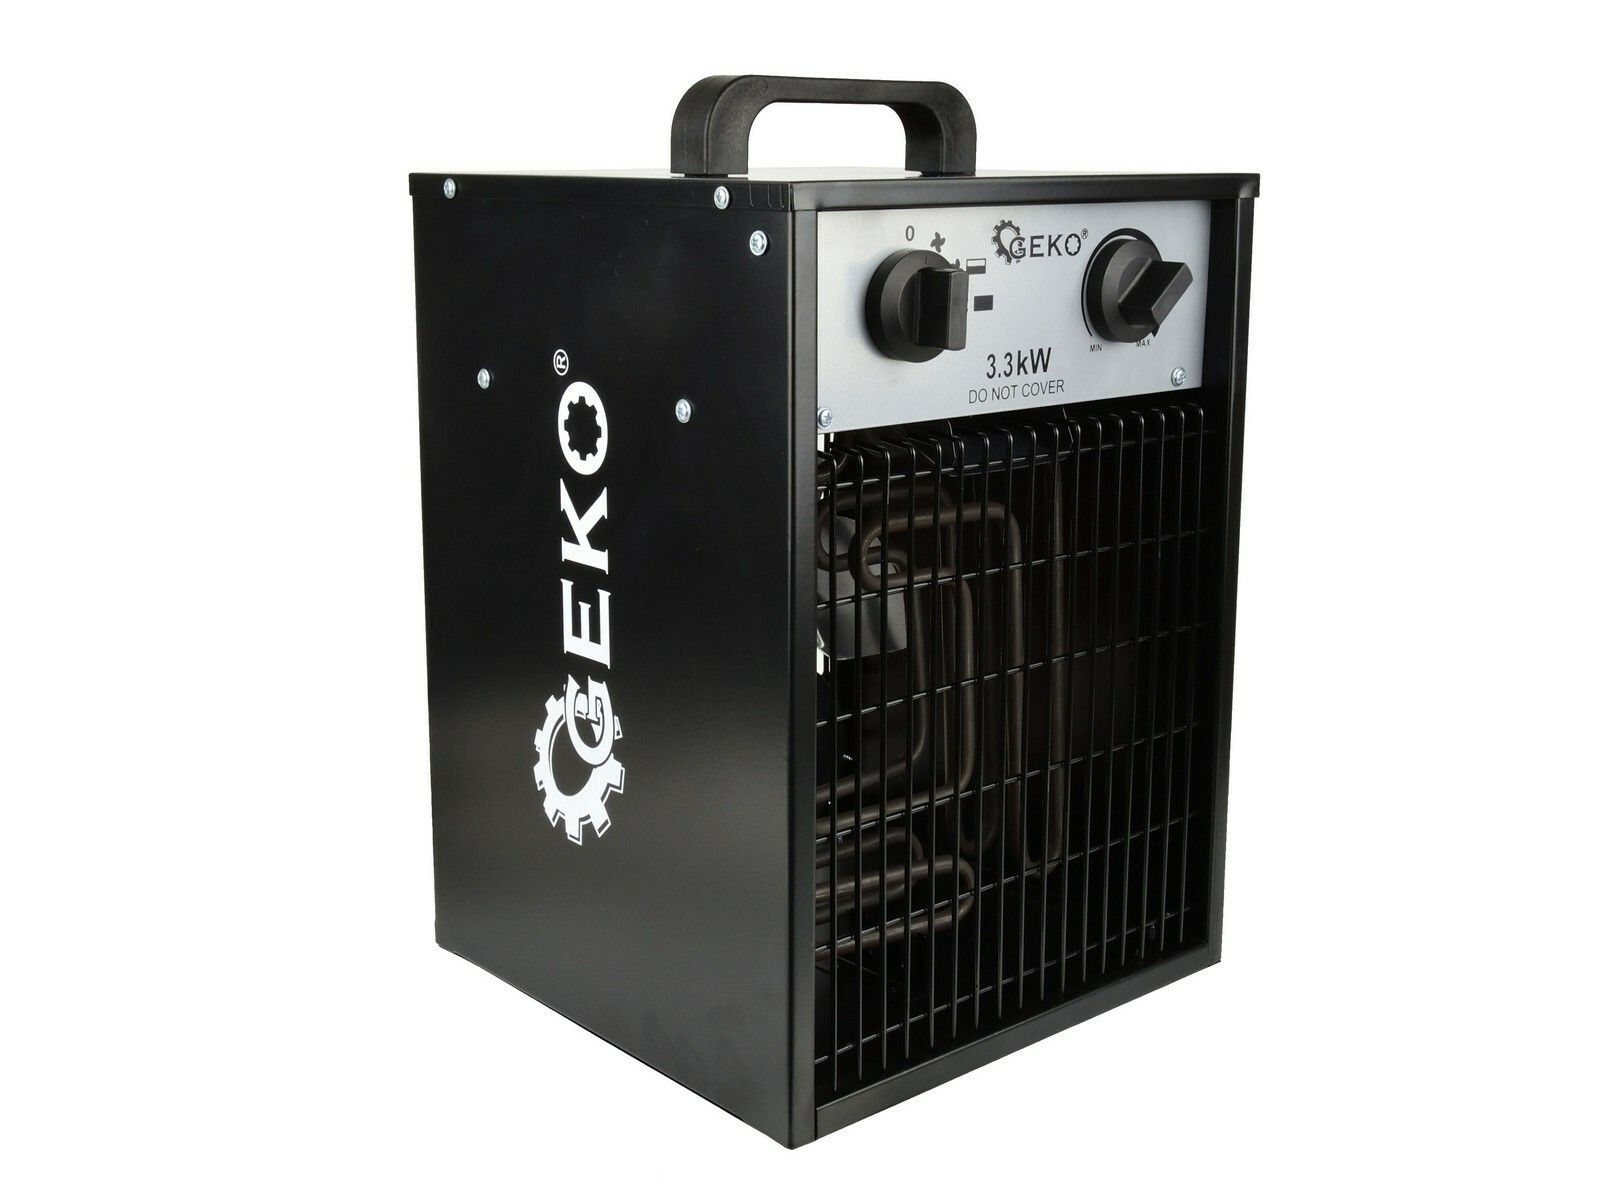 Elektrický ohřívač vzduchu s ventilátorem 3,3kW